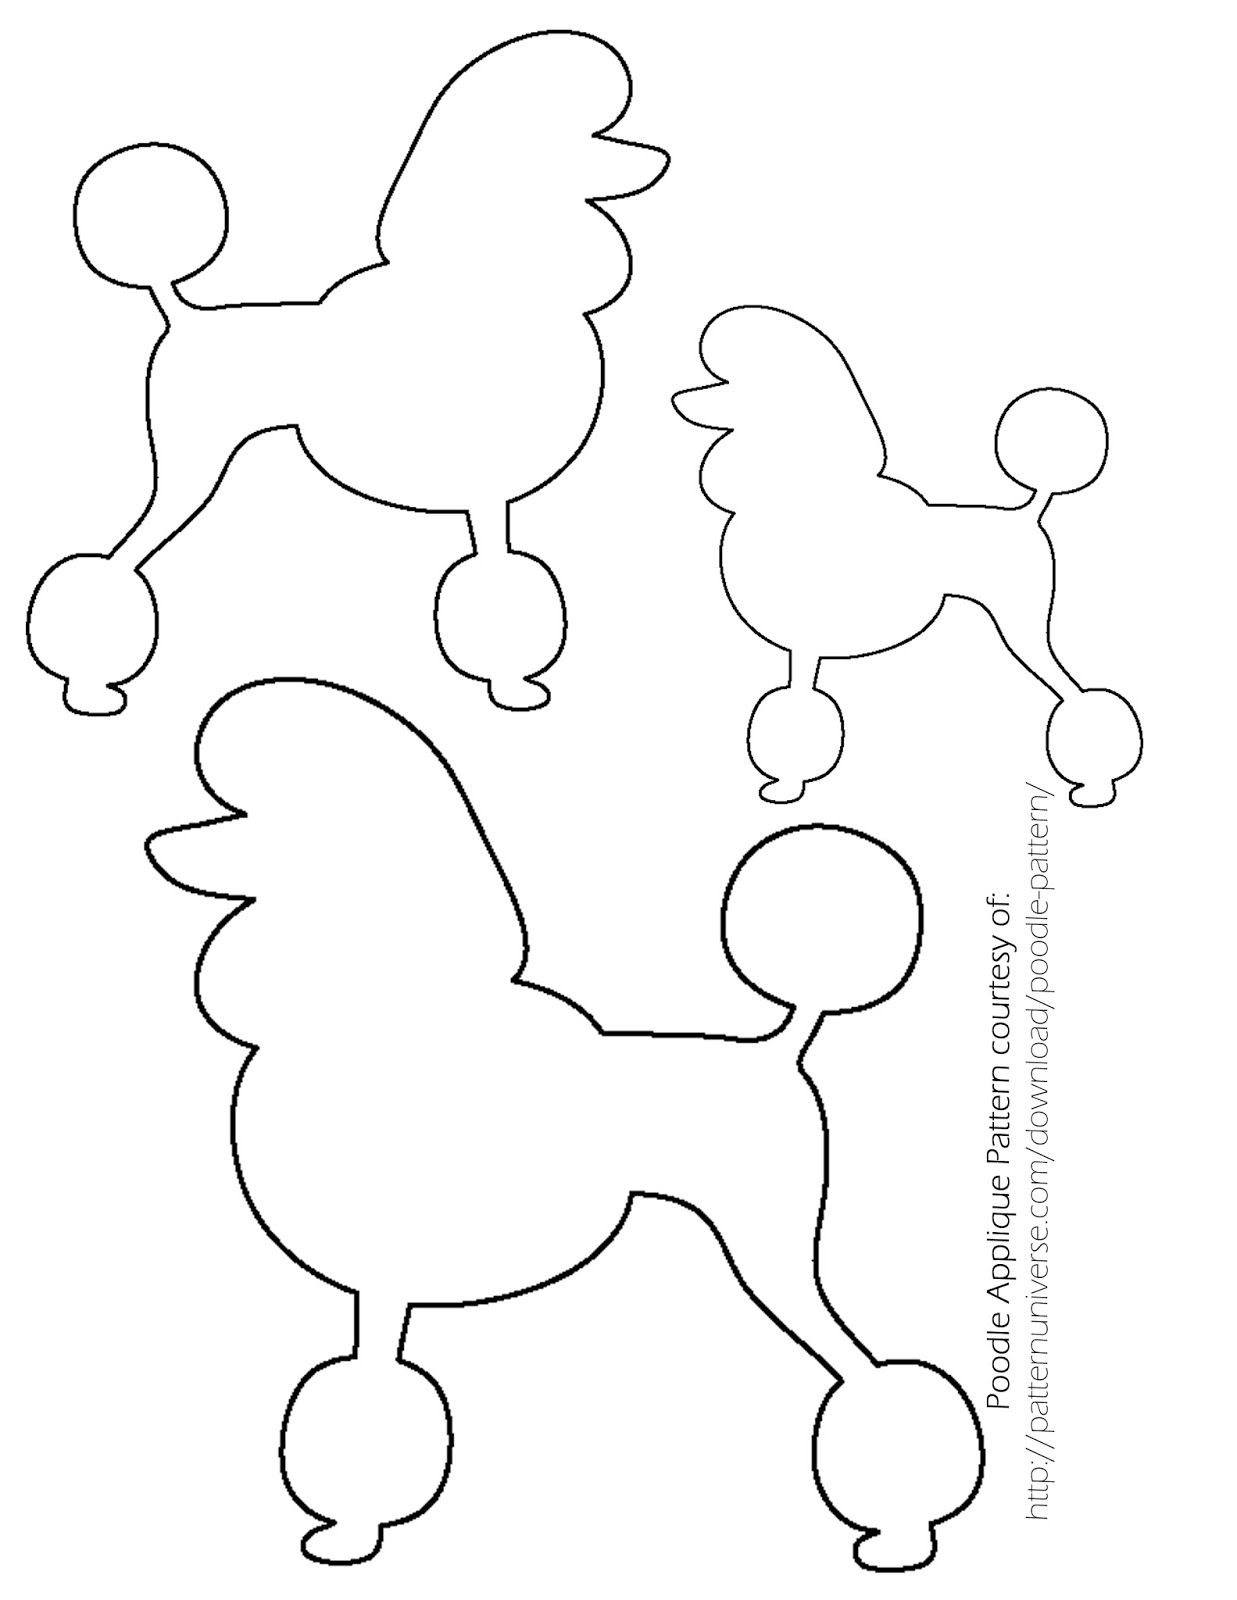 Sock Hop Poodle Skirt - The Ribbon Retreat Blog | Little Girls - Free Printable Poodle Template